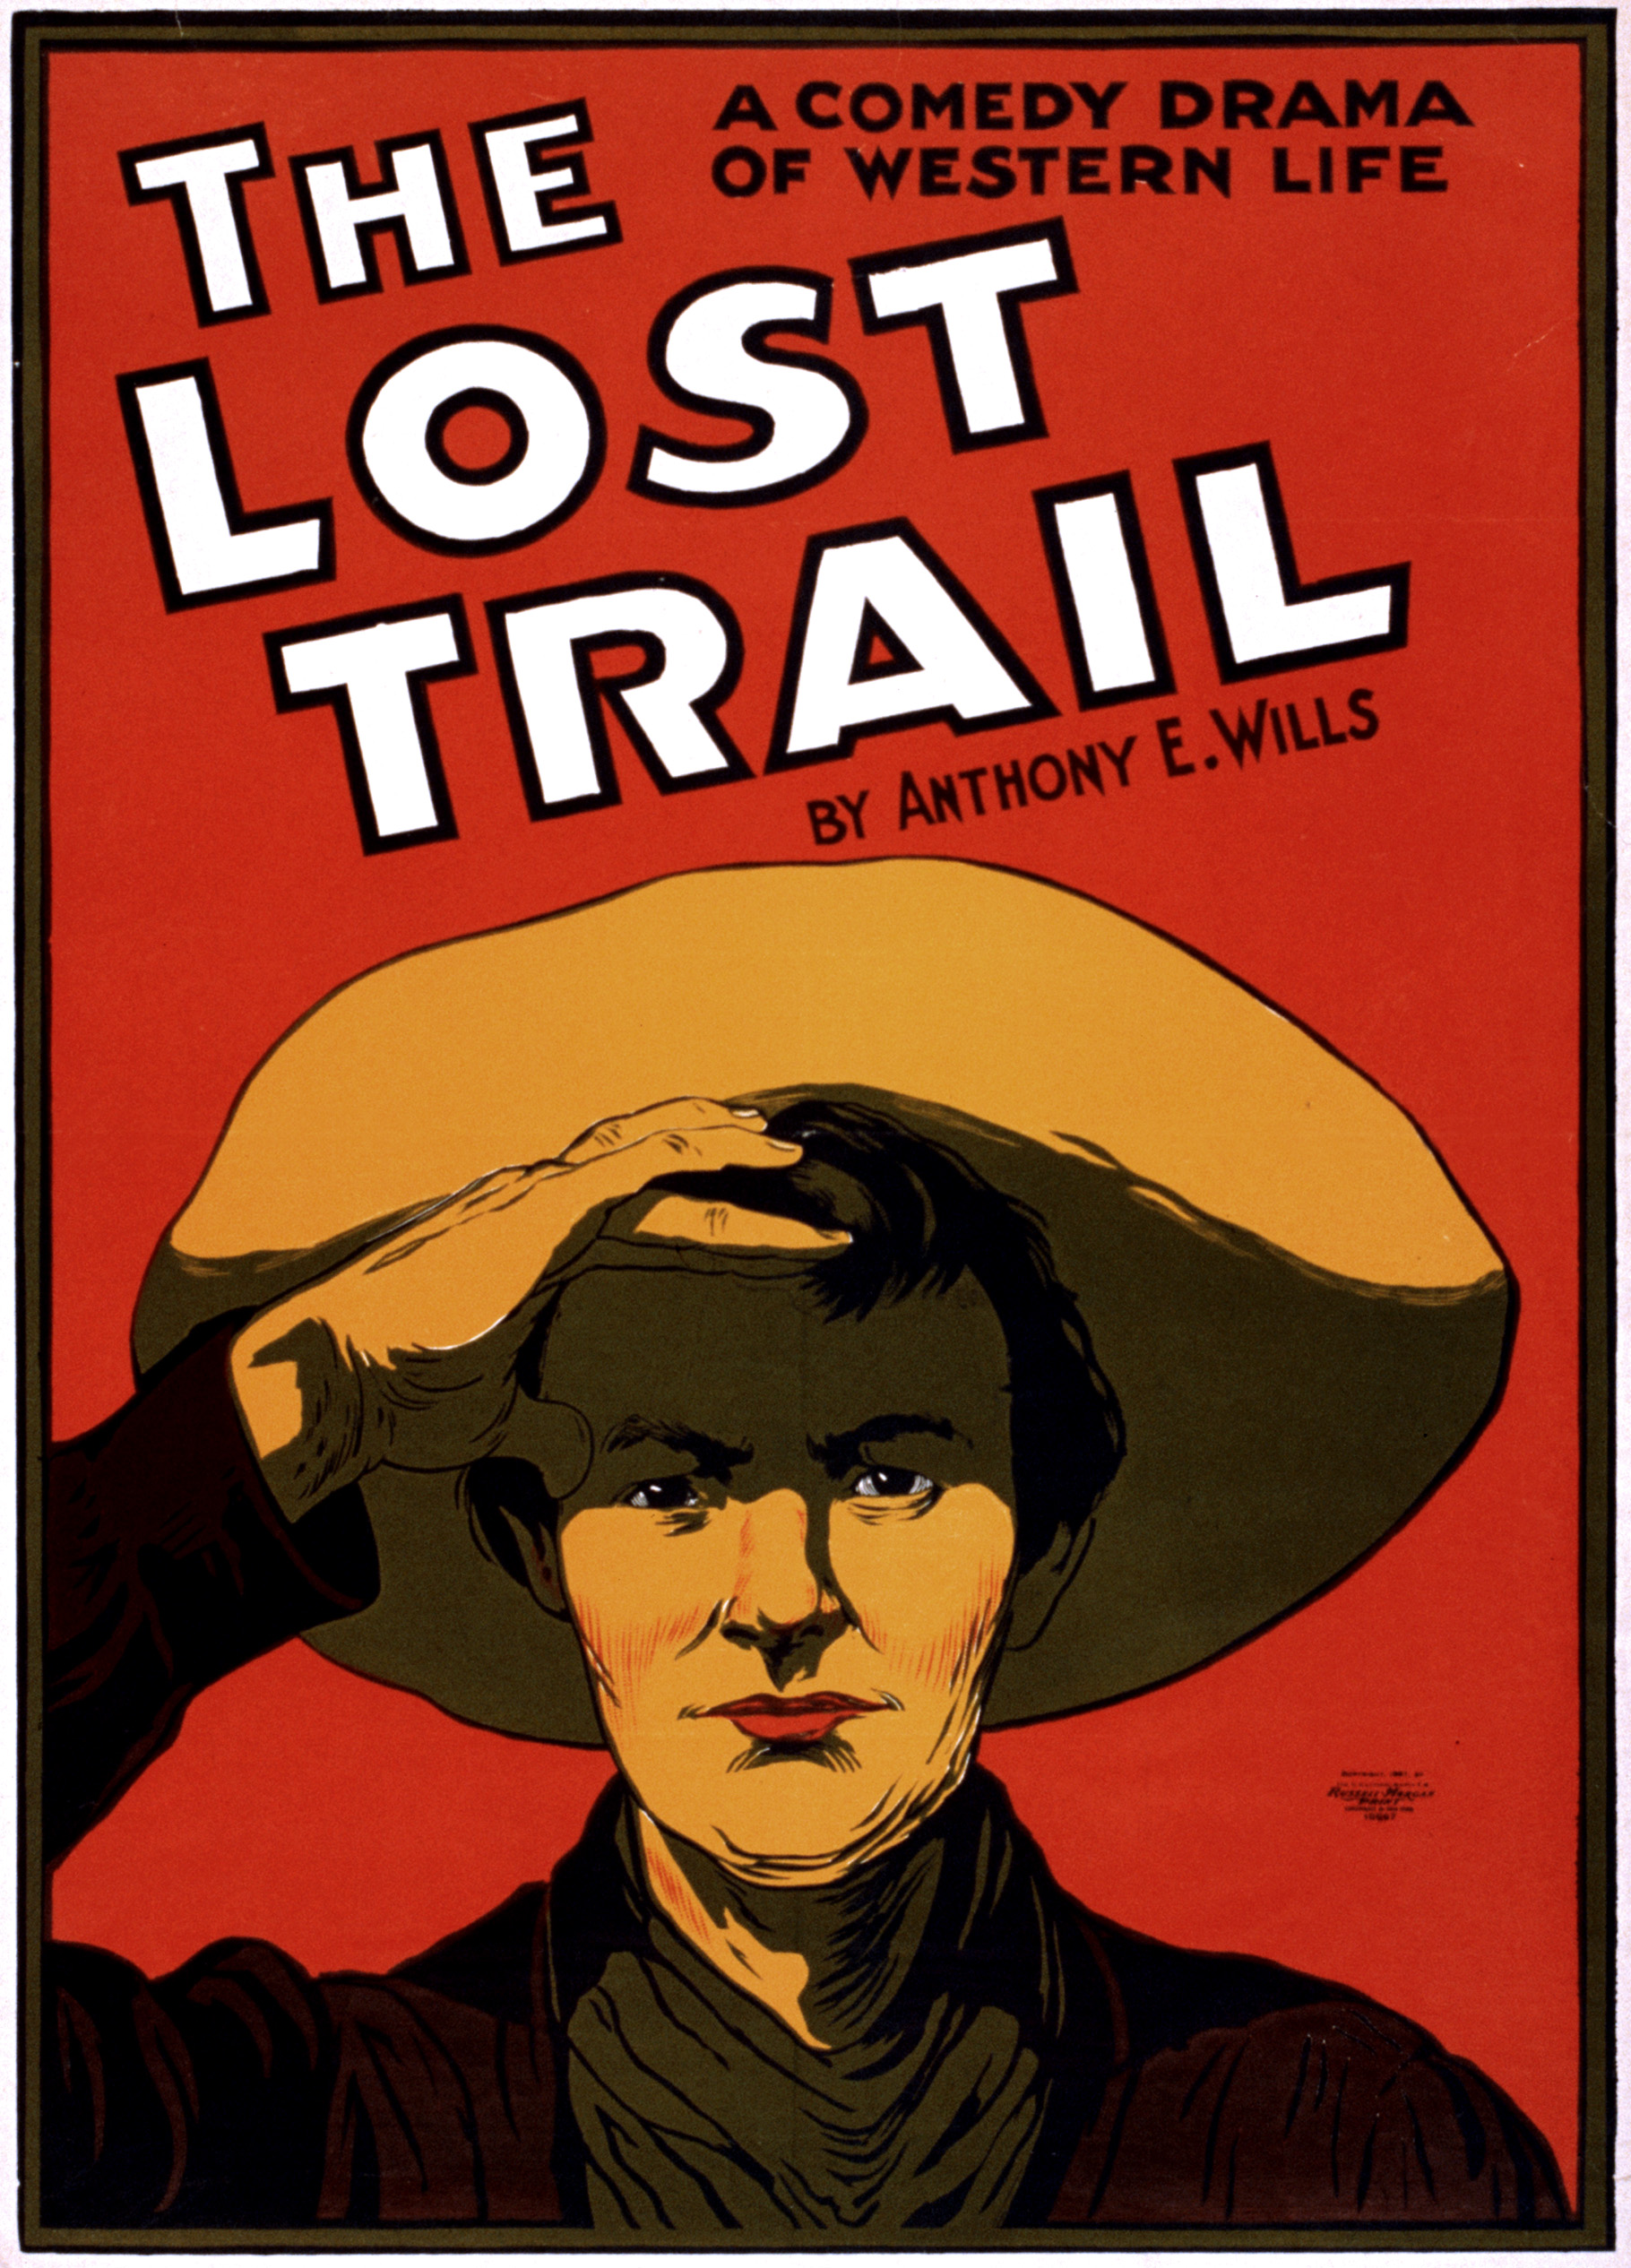 filethe lost trail broadway poster 1907jpg wikimedia